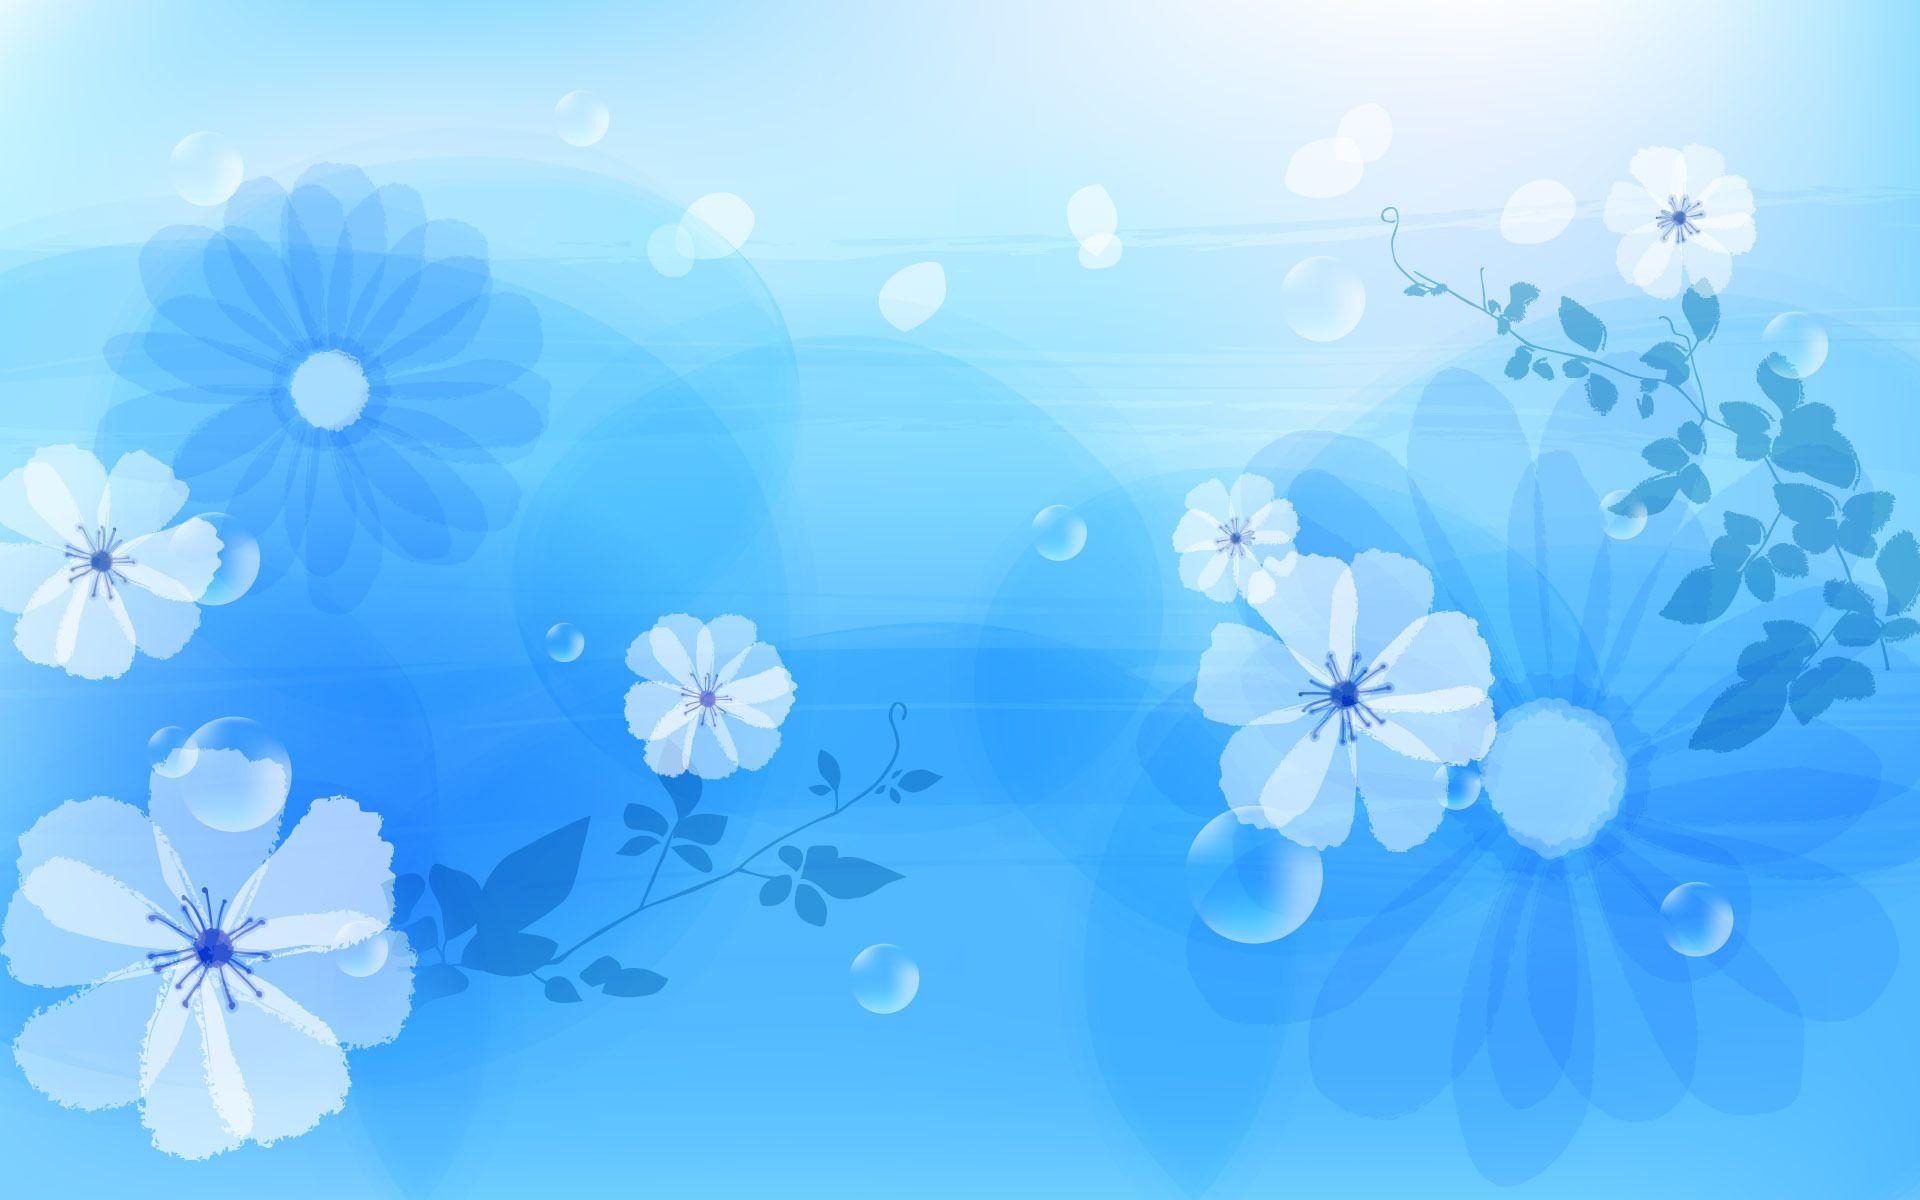 Flower on Blue Wallpaper Desktop Wallpaper Blue flowers